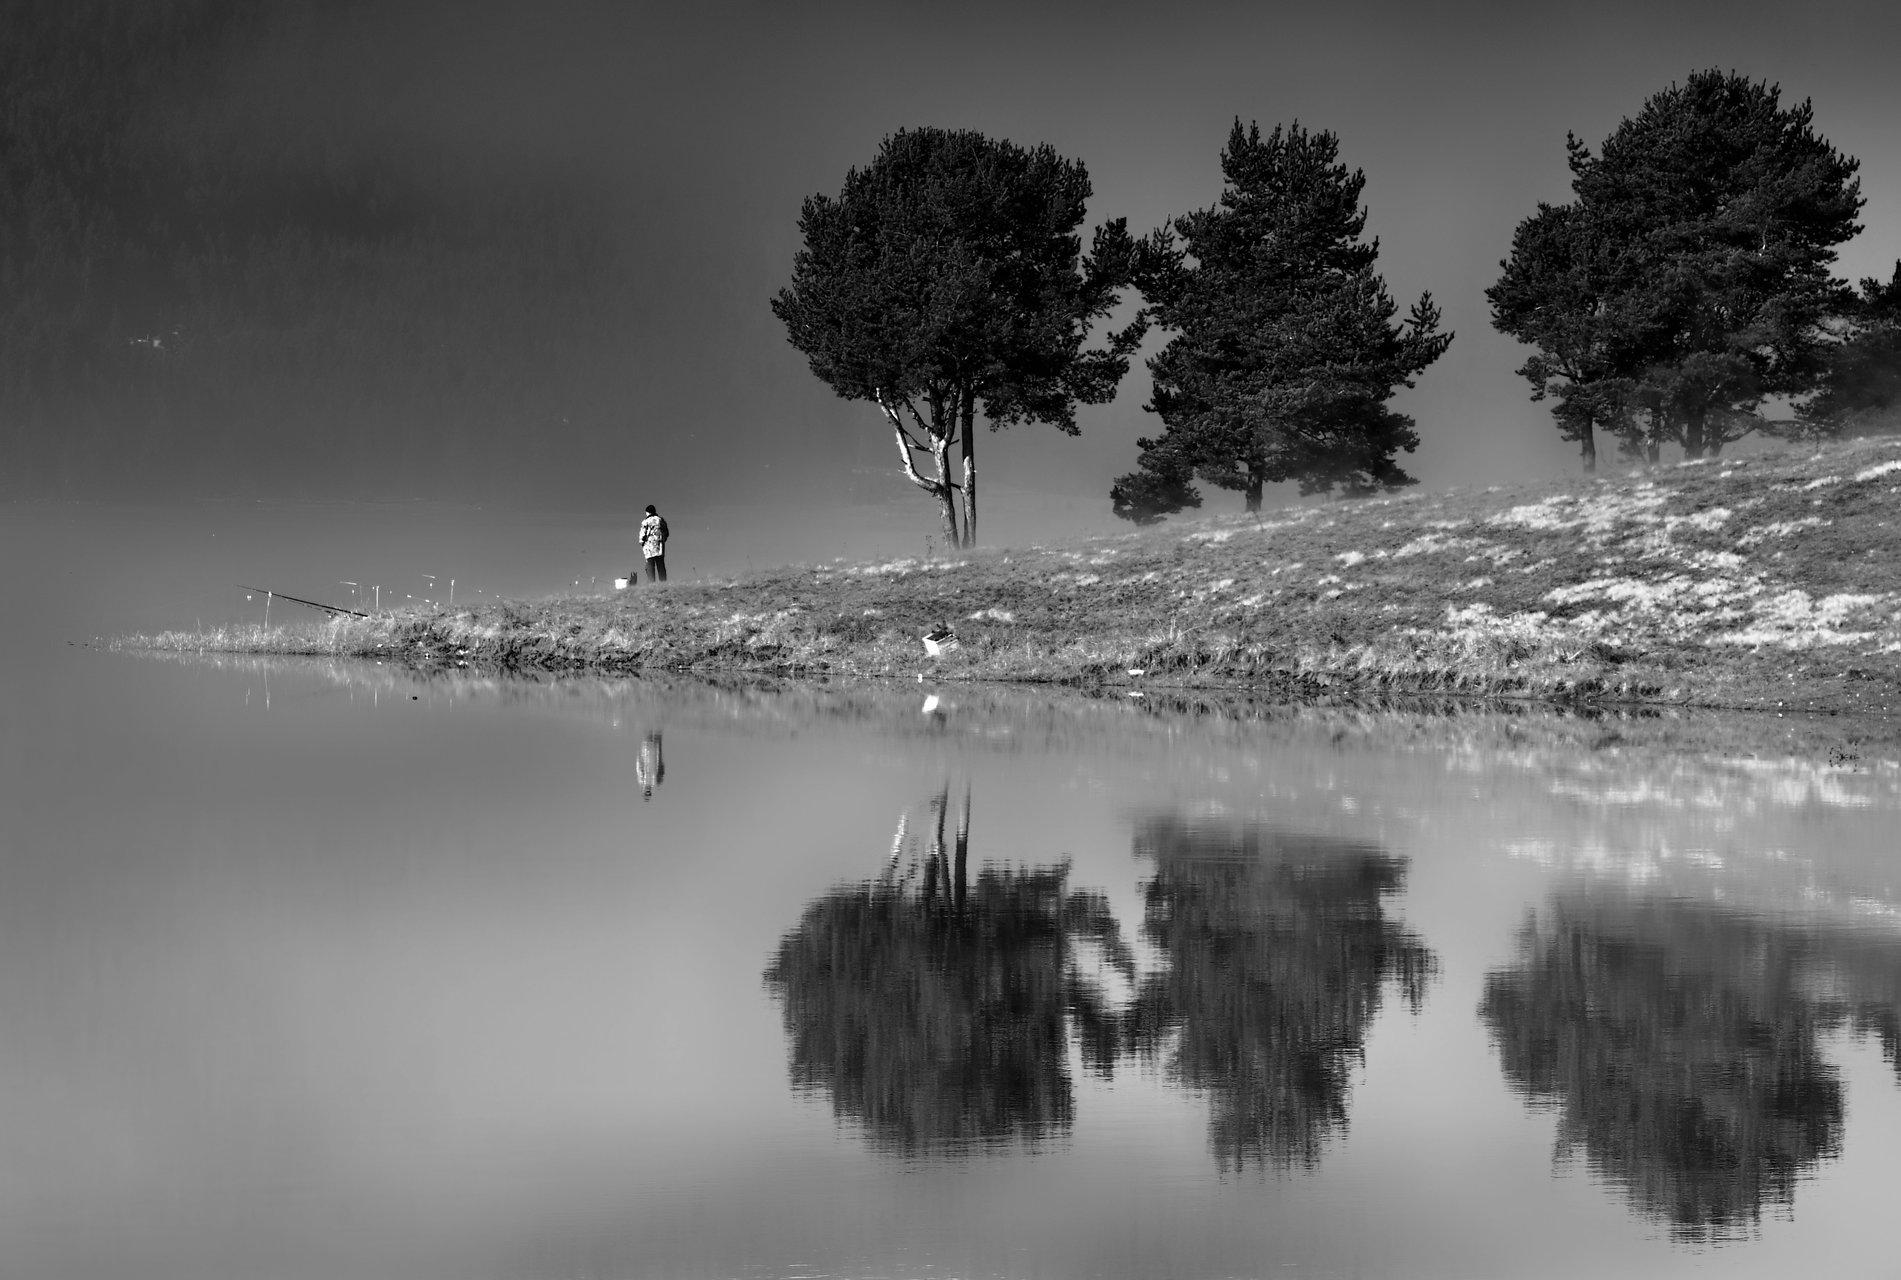 Photo in Everything else   Author ivan barov - kolmik   PHOTO FORUM